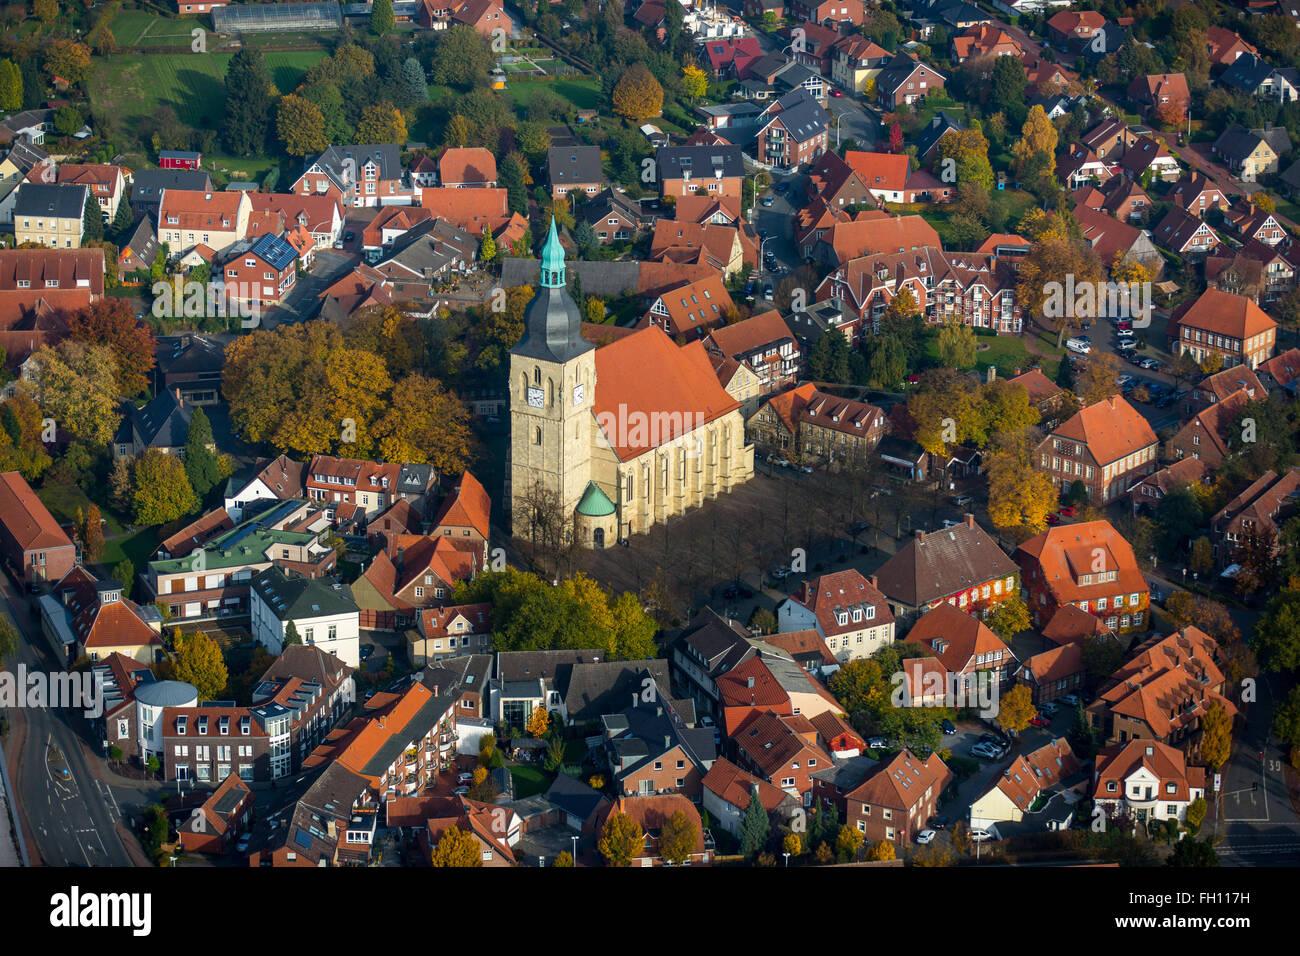 Town center with St. Martinus Church, Nottuln, Münsterland, North Rhine-Westphalia, Germany - Stock Image